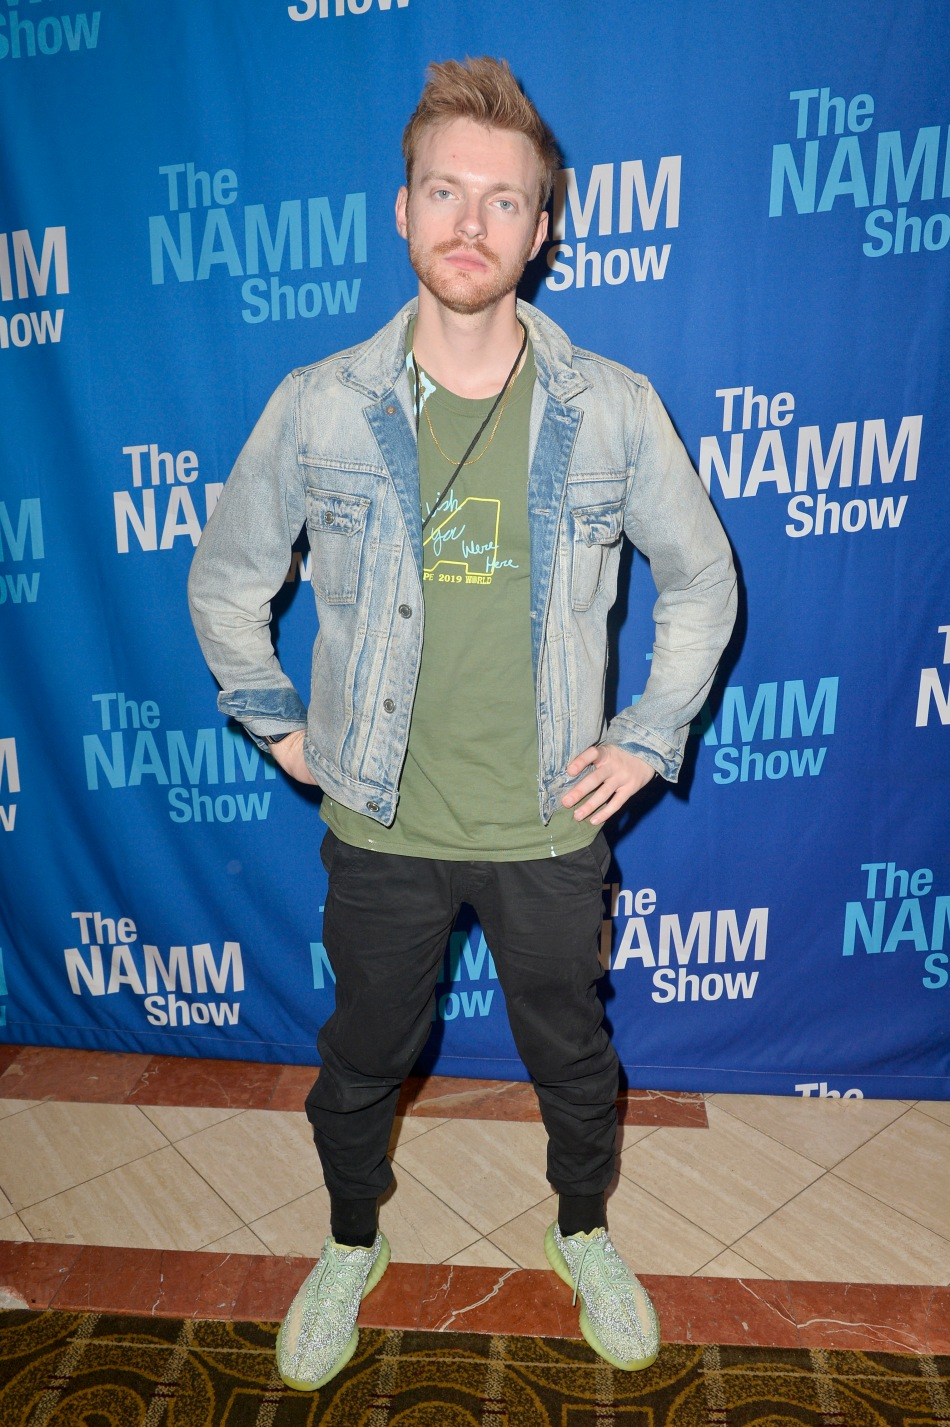 The 2020 NAMM Show, Friday, January 17